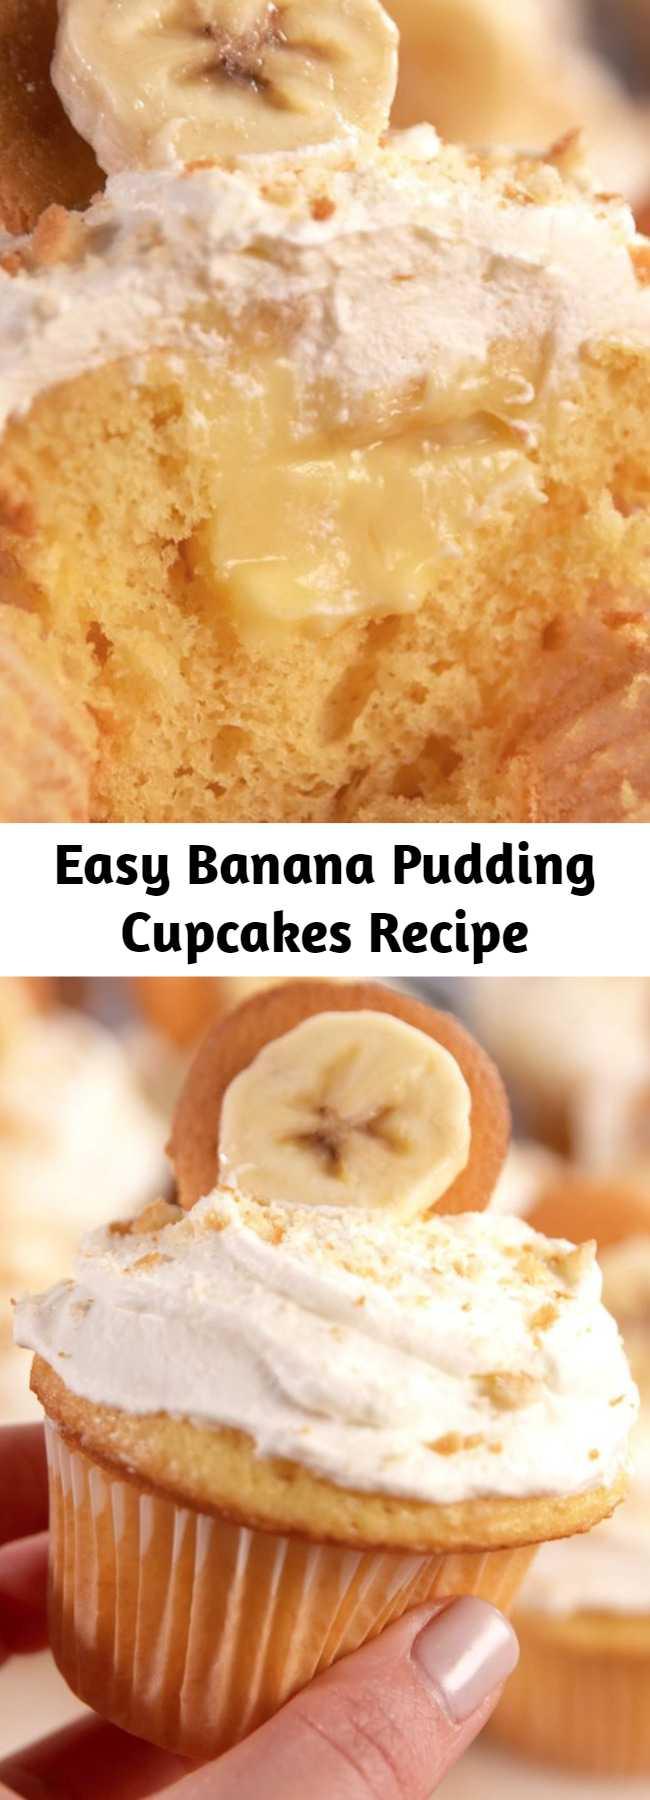 Easy Banana Pudding Cupcakes Recipe - Check out this easy recipe for adorable banana pudding cupcakes. Banana pudding lovers rejoice!